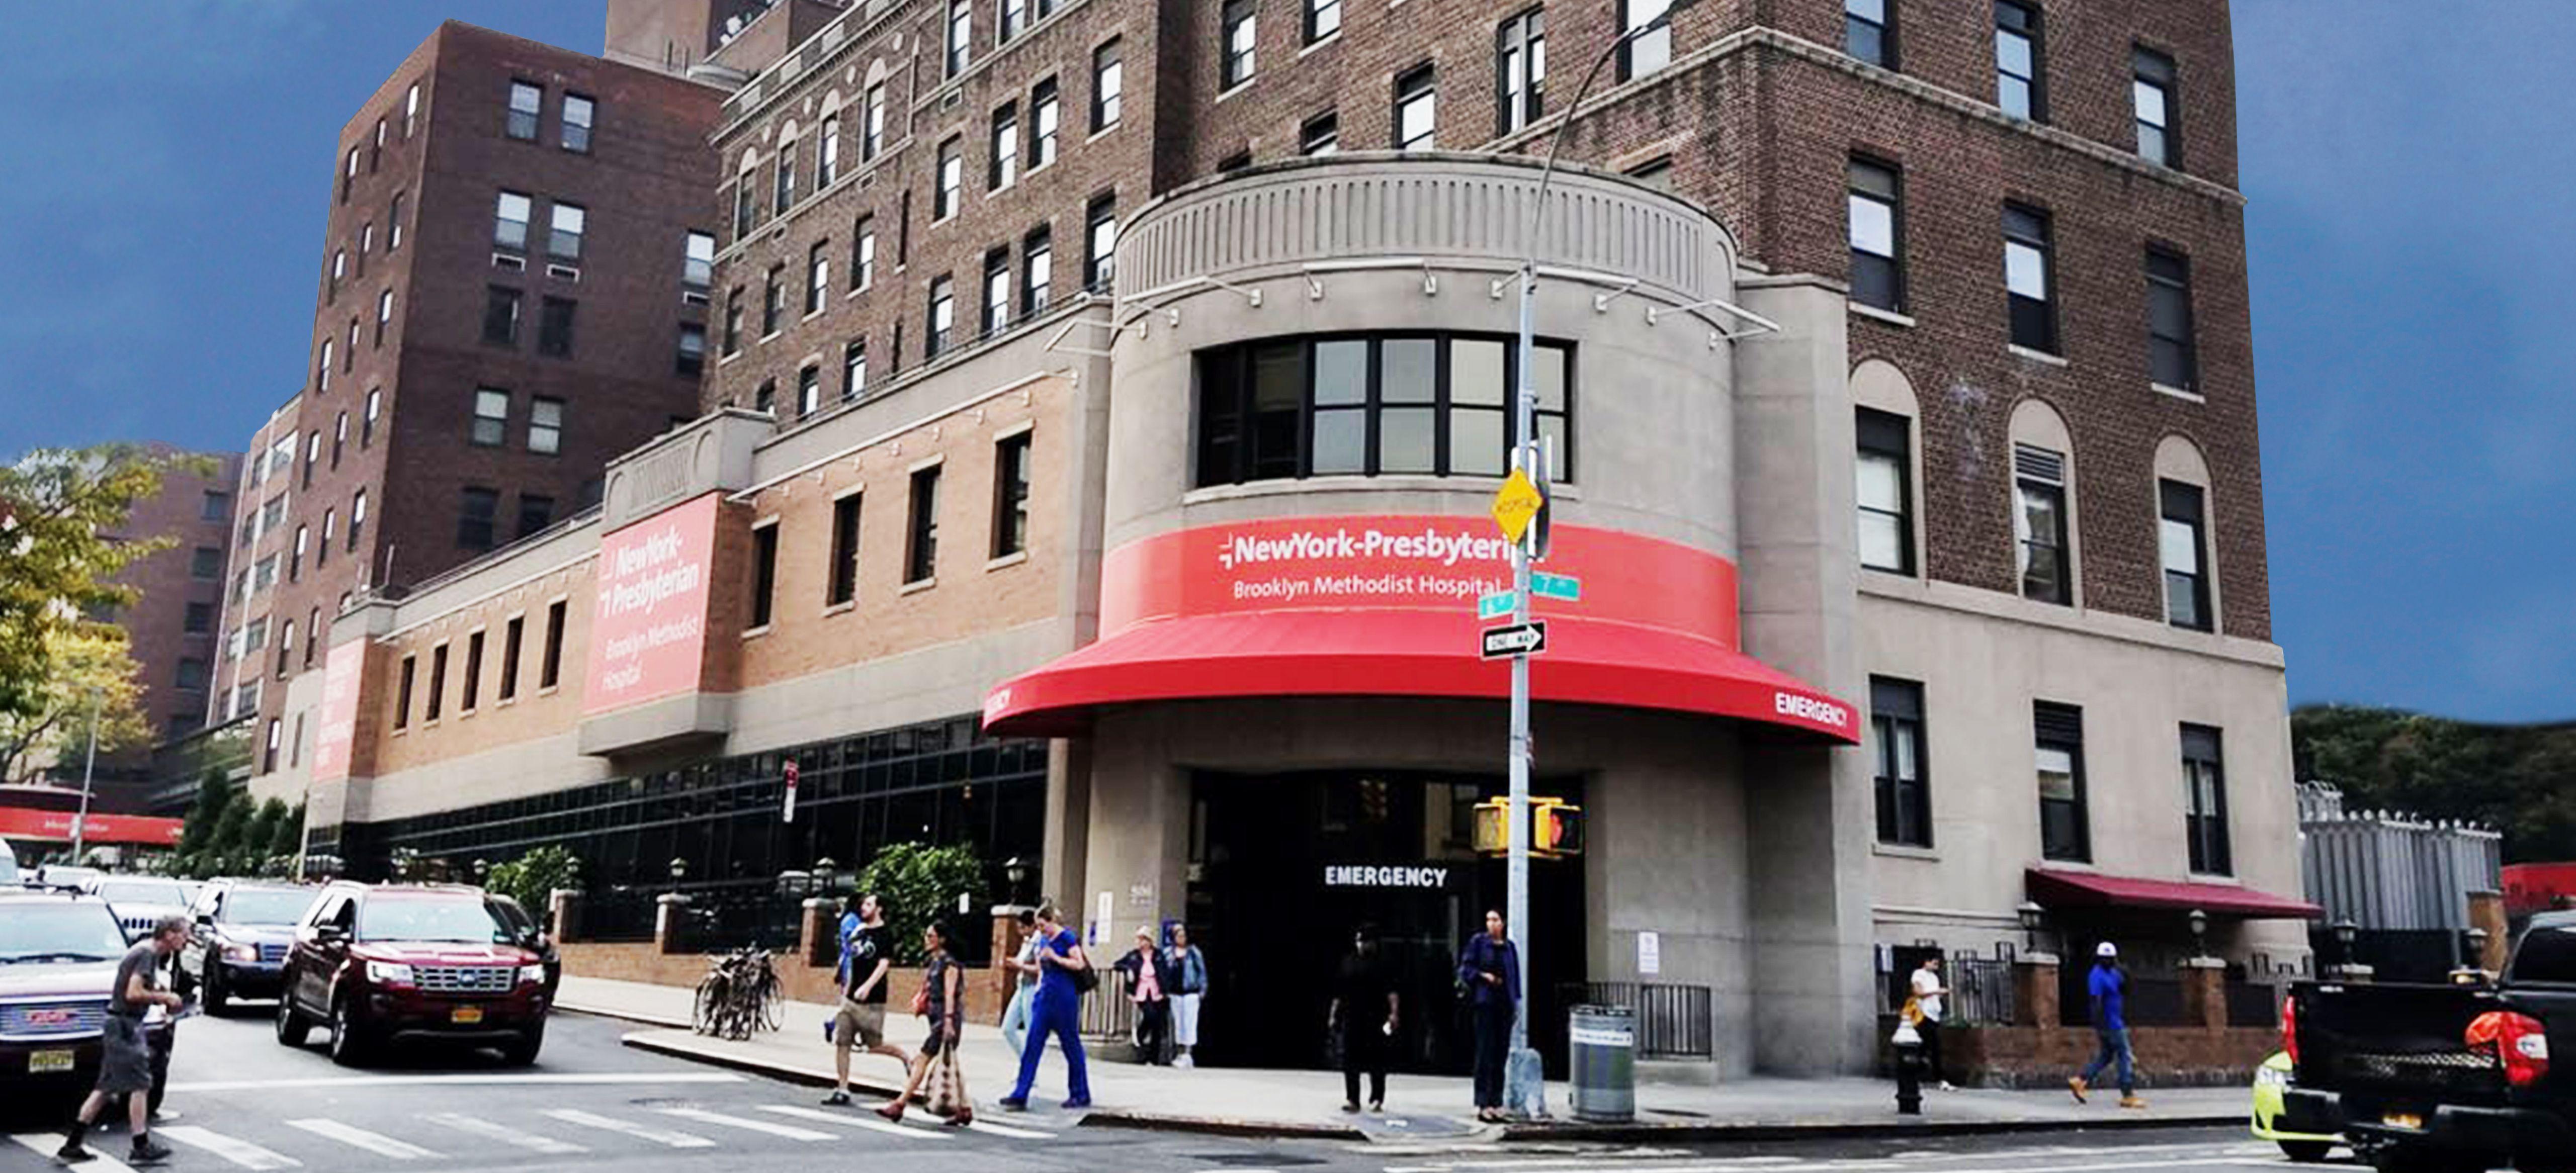 NYP Methodist